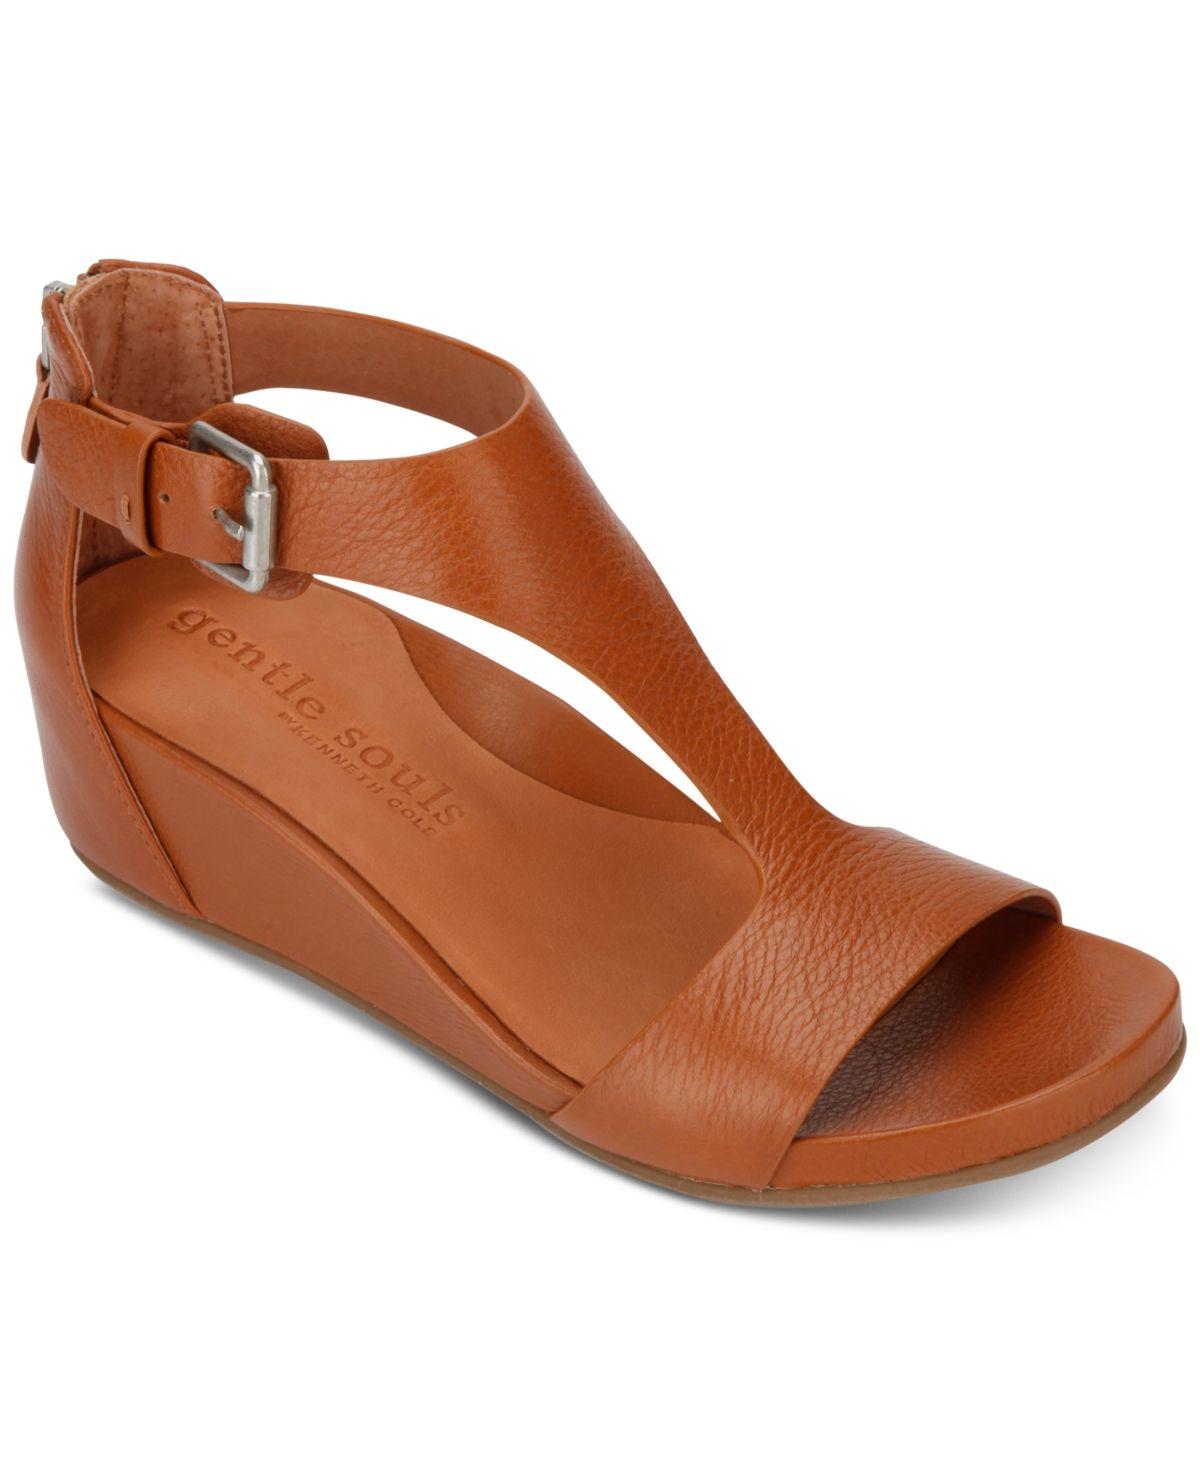 Gentle Souls by Kenneth Cole Womens Gisele Wedge Sandals & Reviews – Sandals & Flip Flops – Shoes – Macys